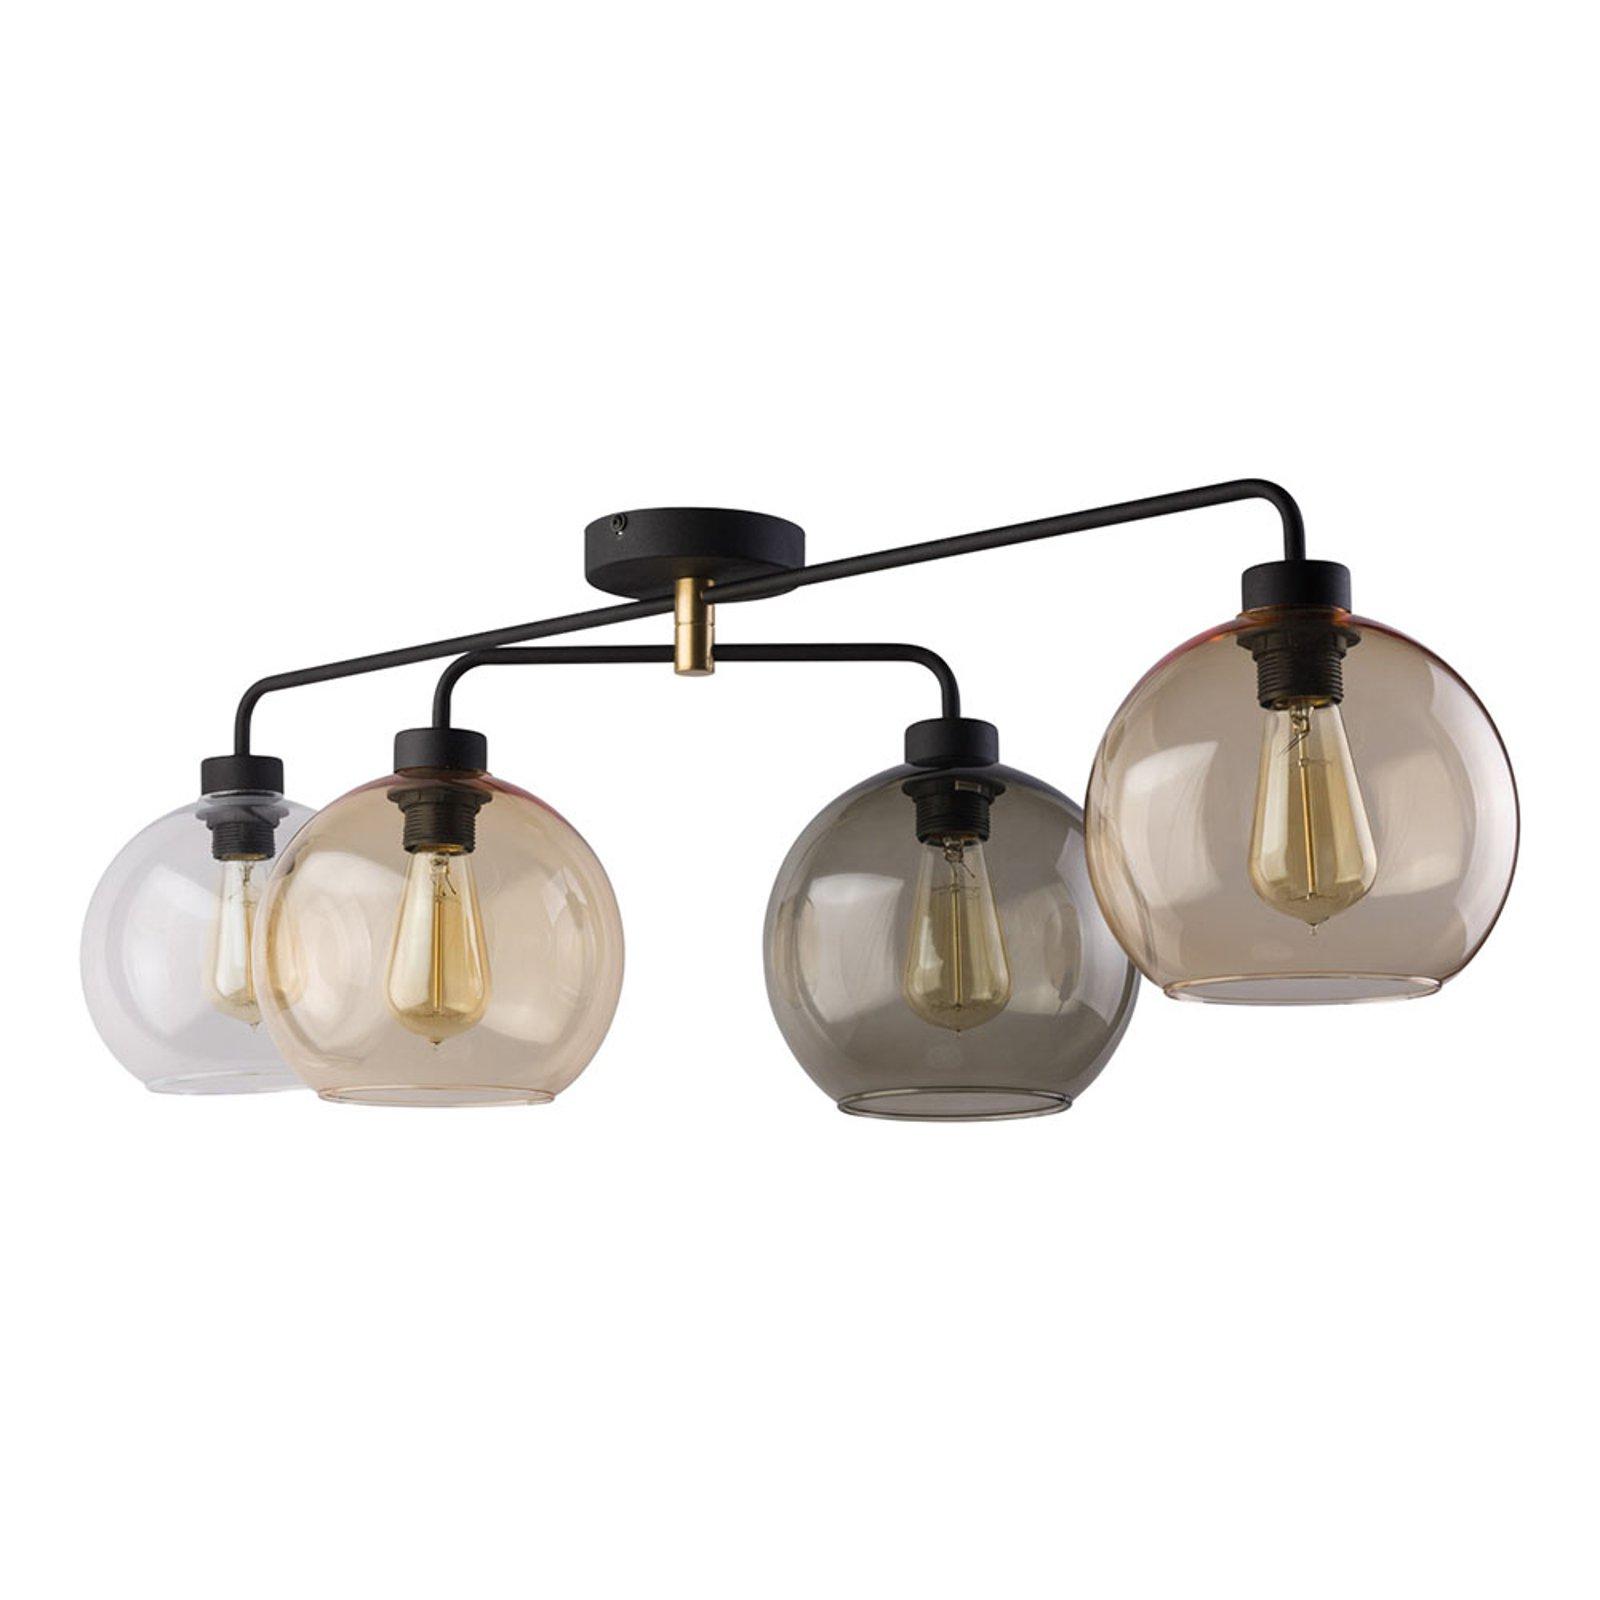 Taklampe Cubus 4 lyskilder klar/bernstein/grå